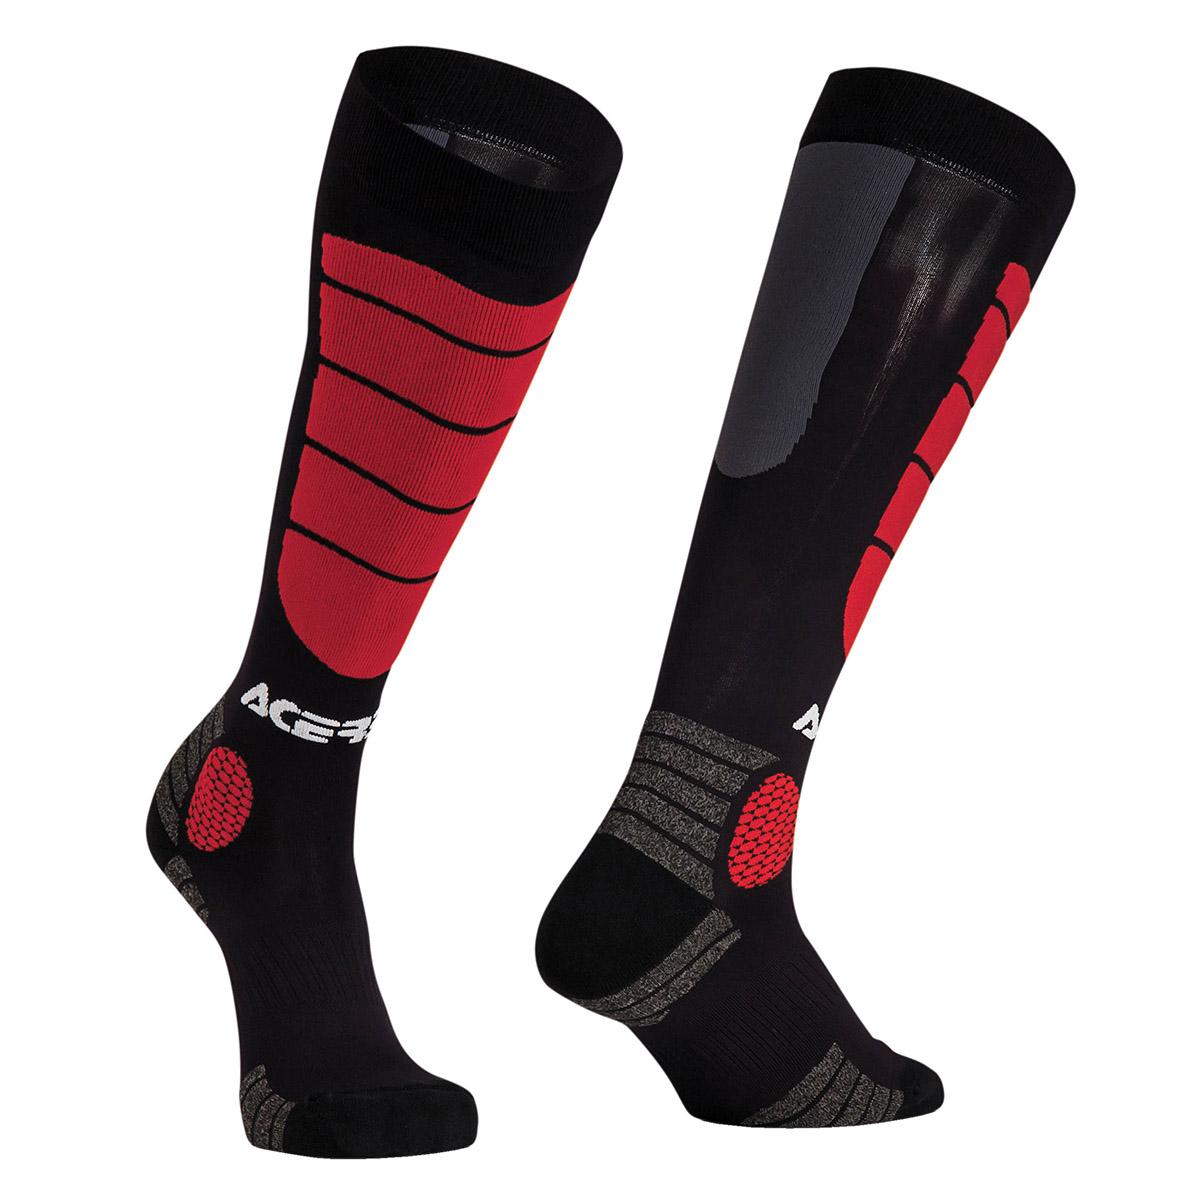 Acerbis Socken MX Impact Schwarz/Rot